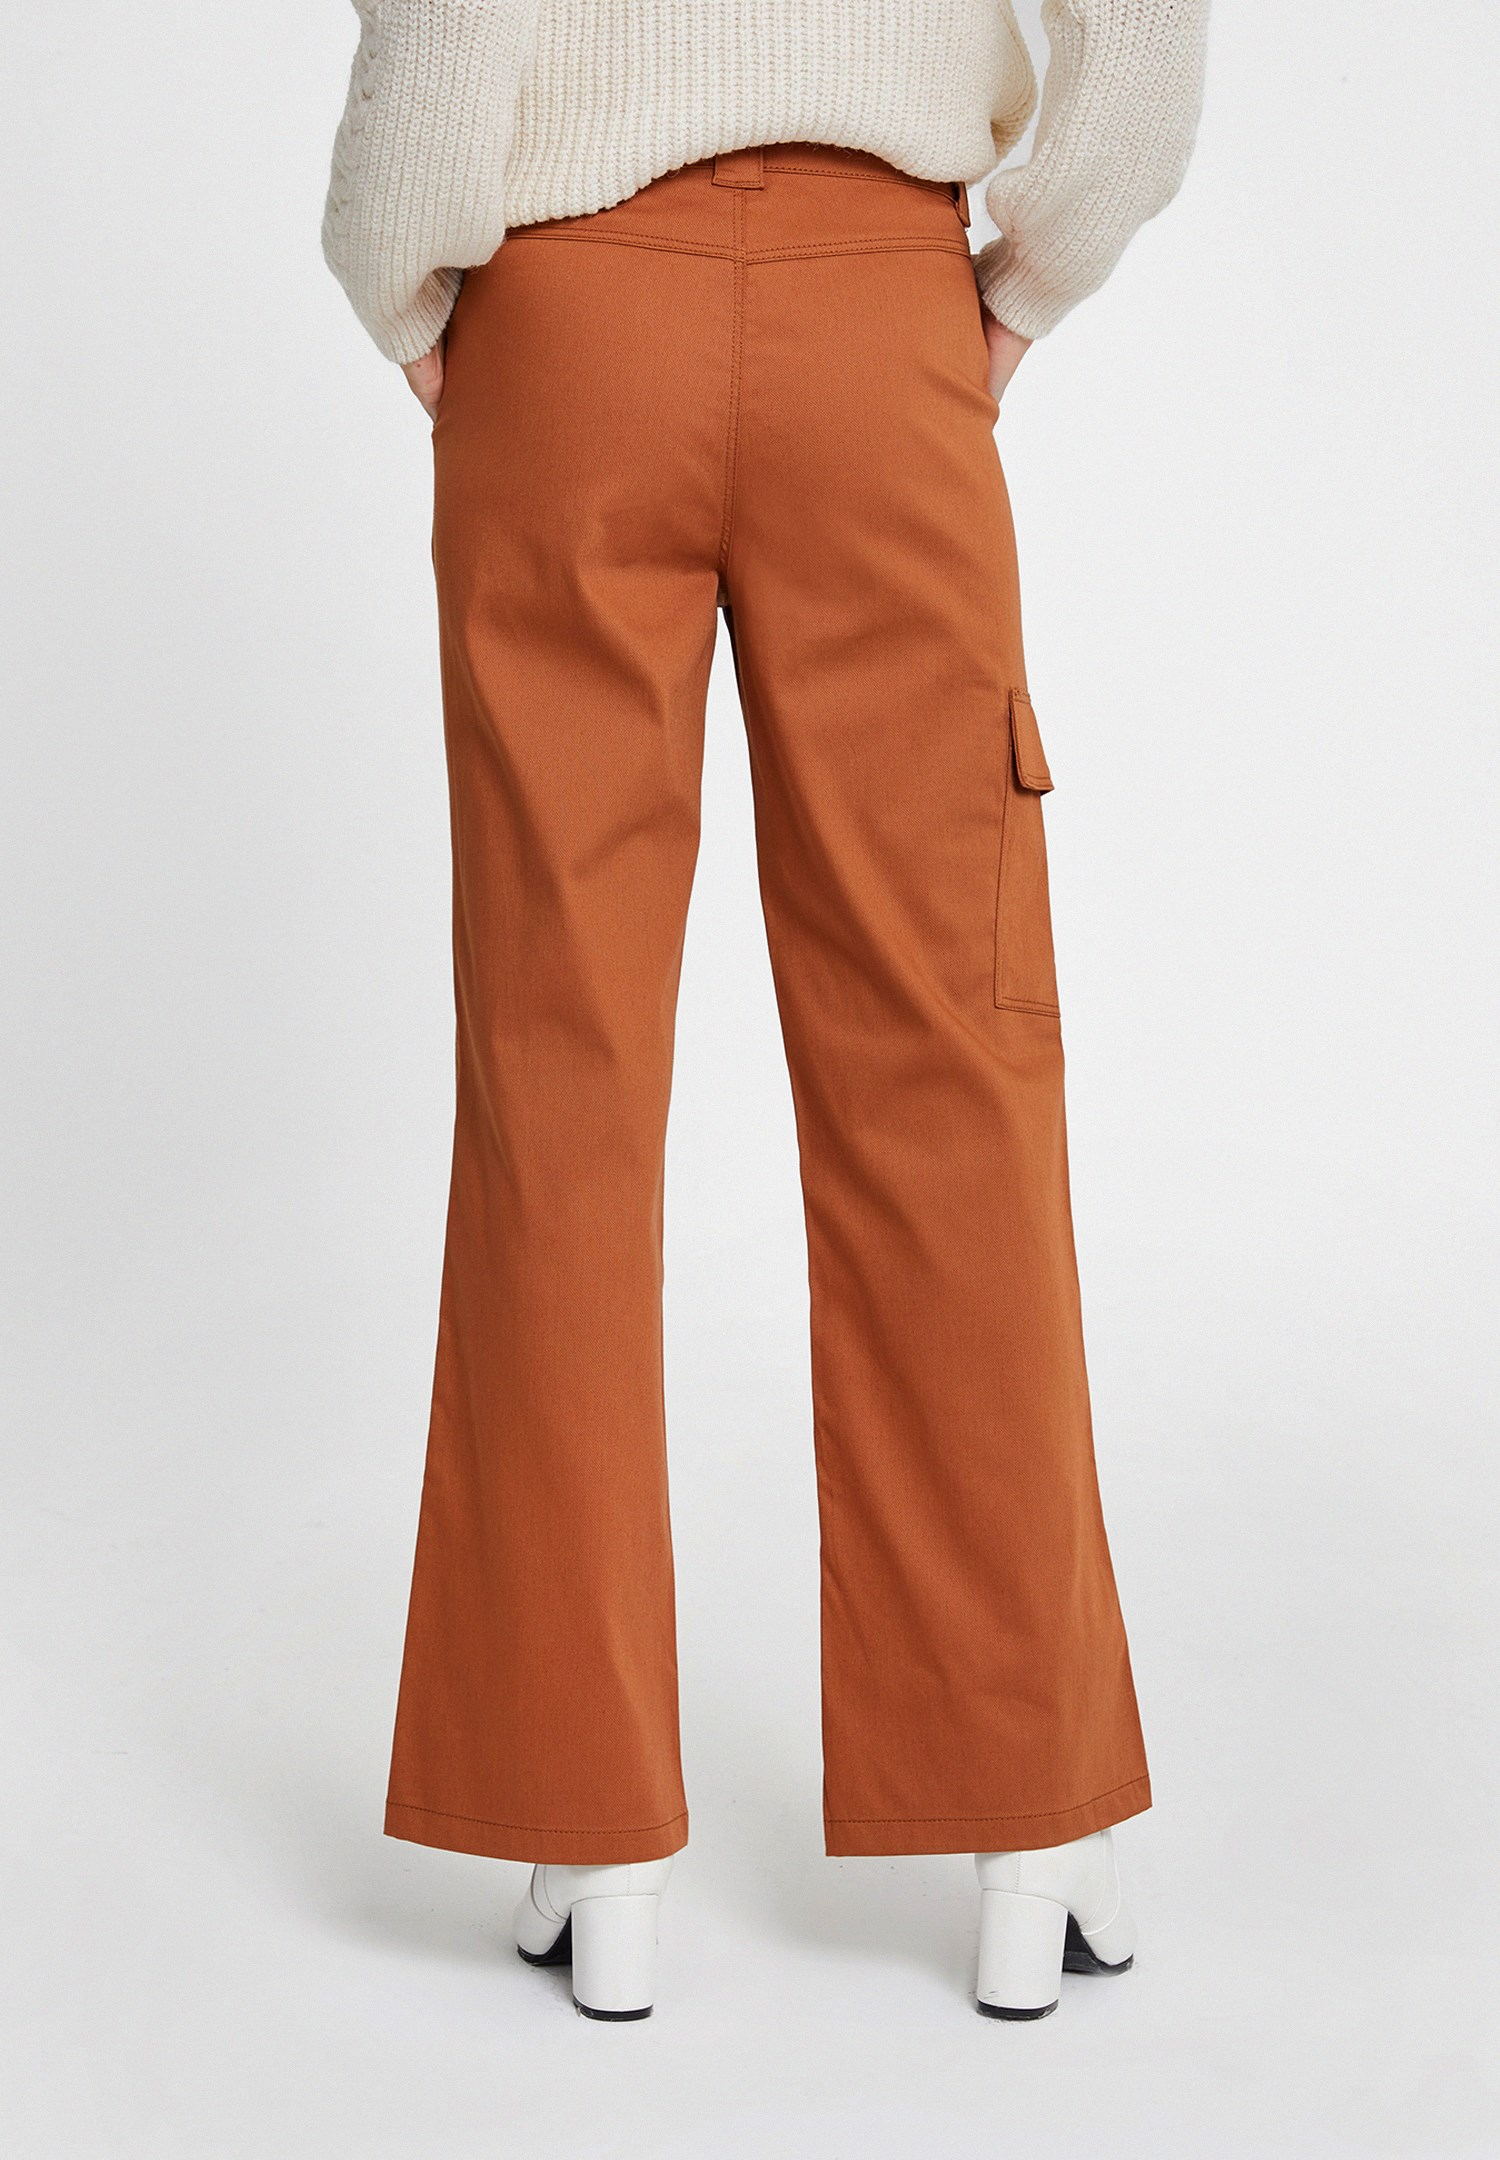 Bayan Kahverengi Cepli Yüksek Bel Pantolon